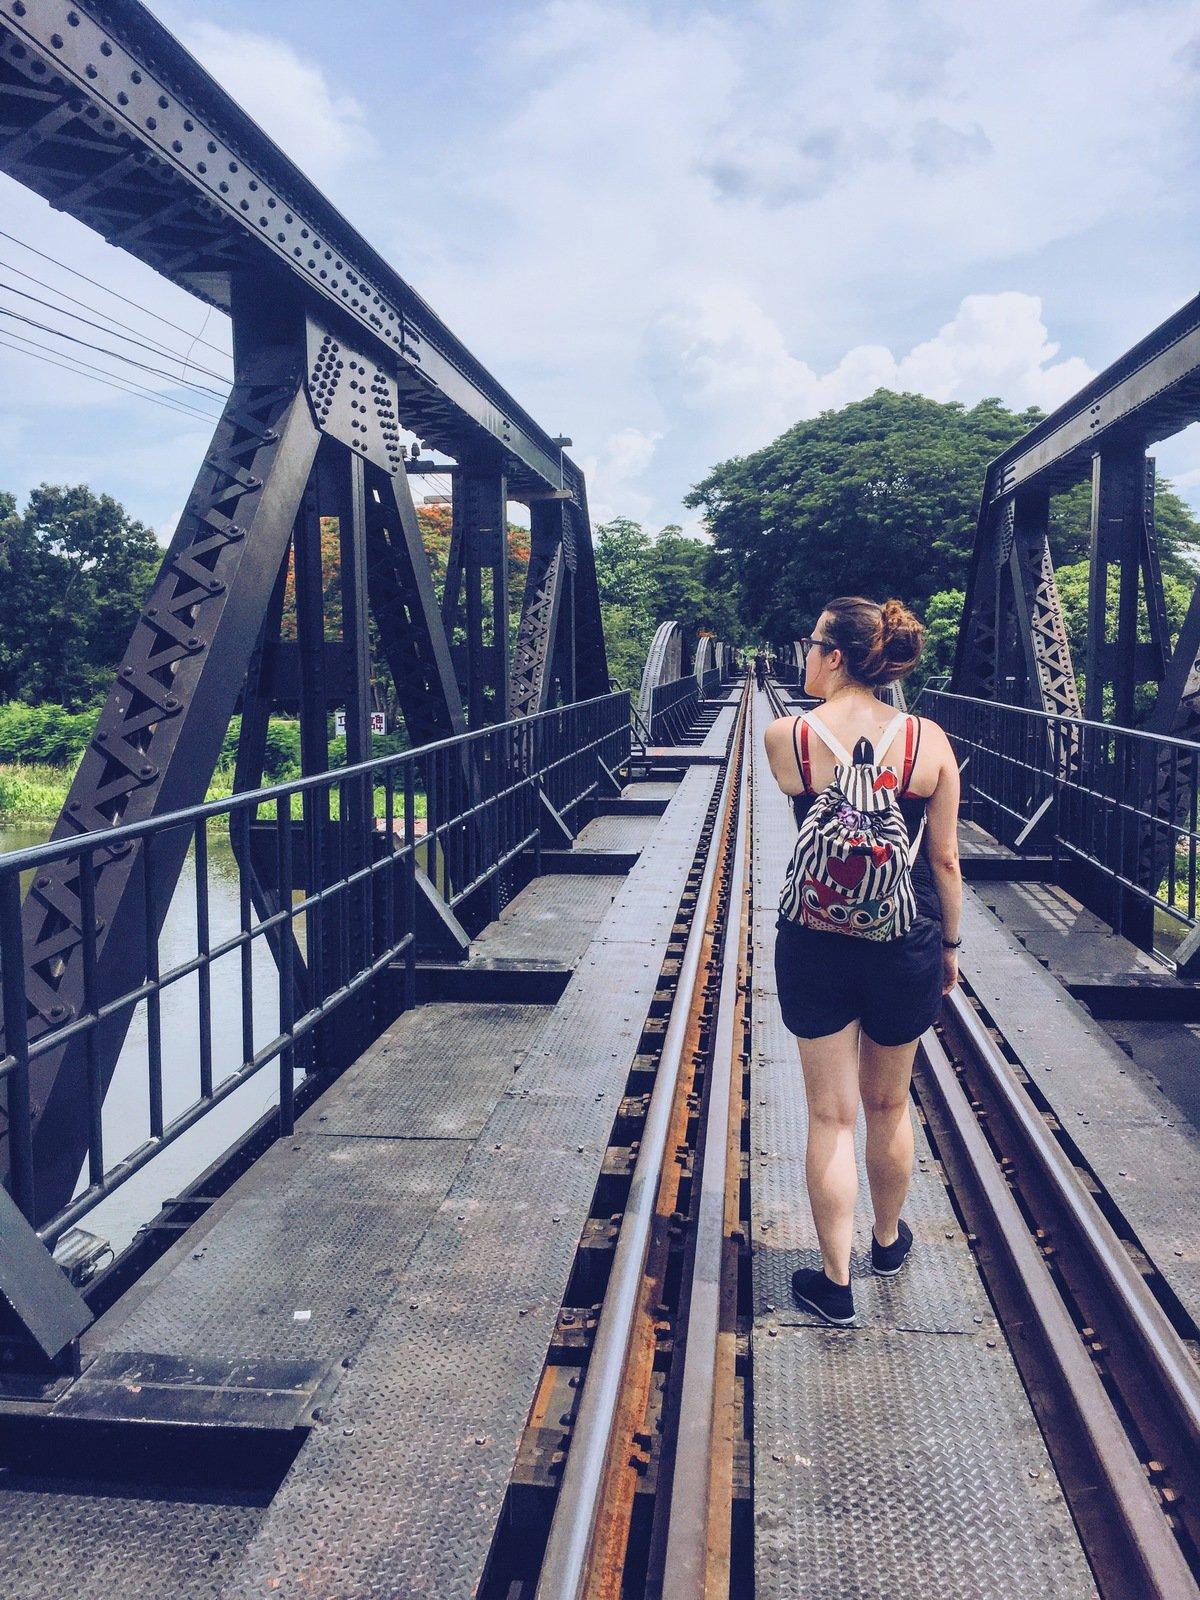 Walking the bridge on the river Kwai in Kanchanaburi Thailand